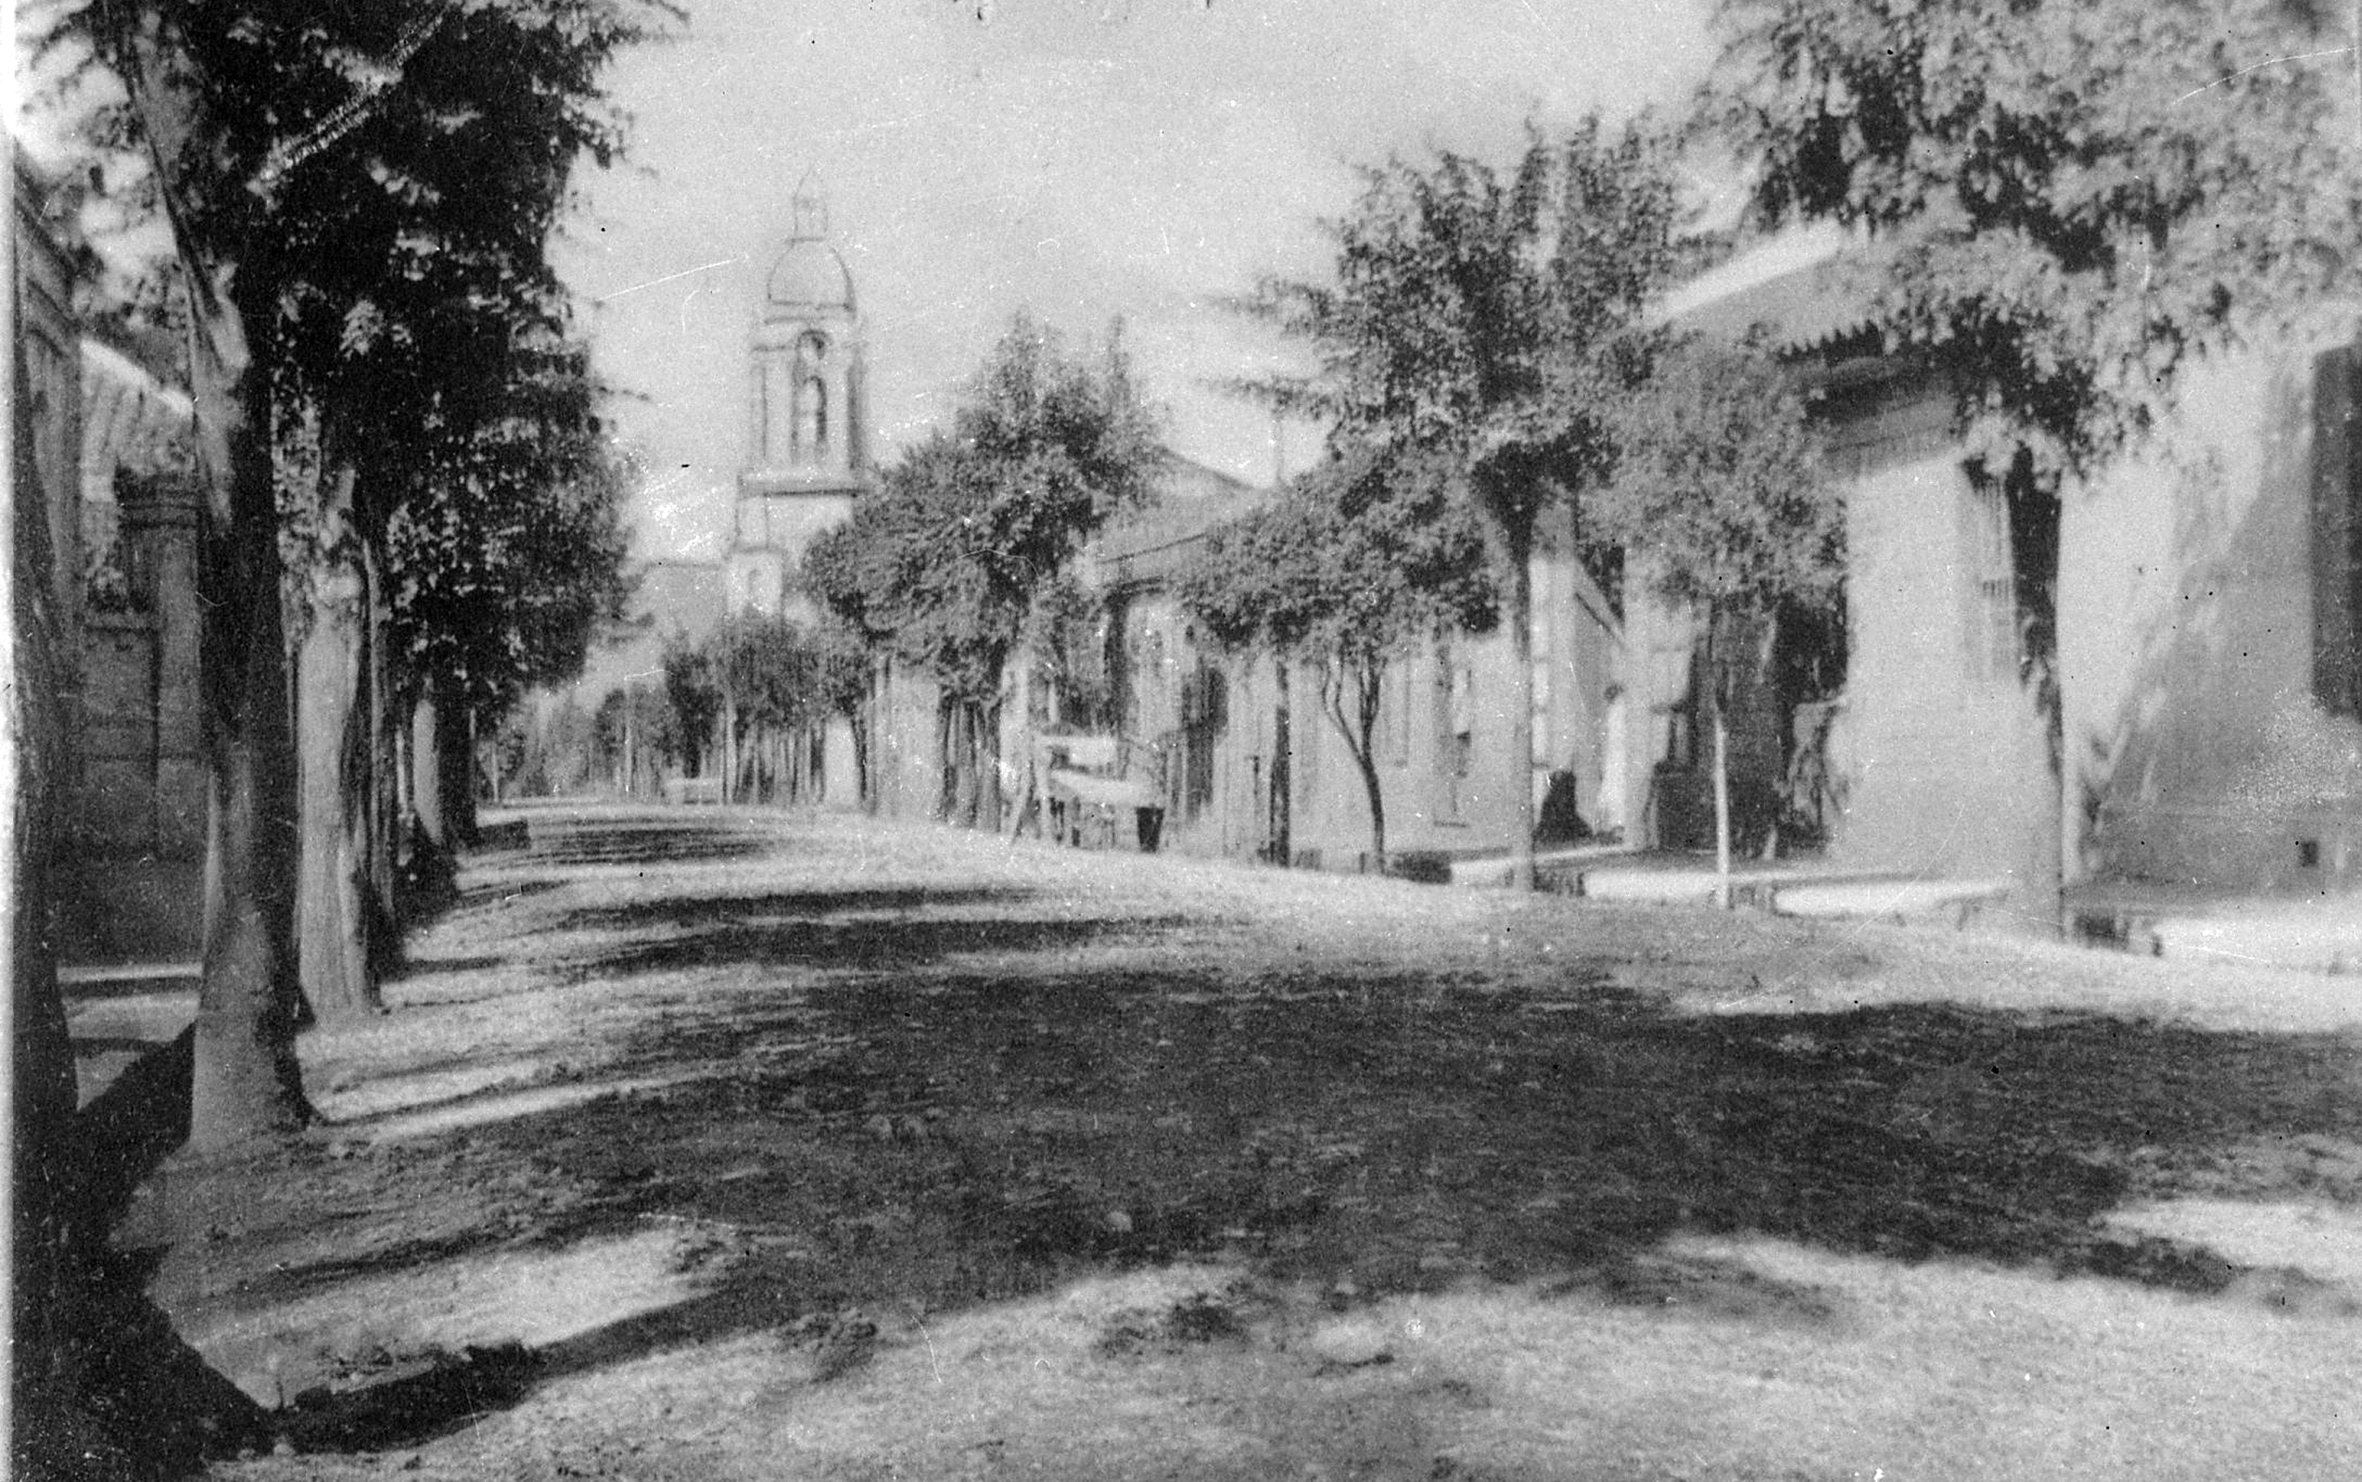 Enterreno - Fotos históricas de chile - fotos antiguas de Chile - Calle Imperial de Angol en 1915